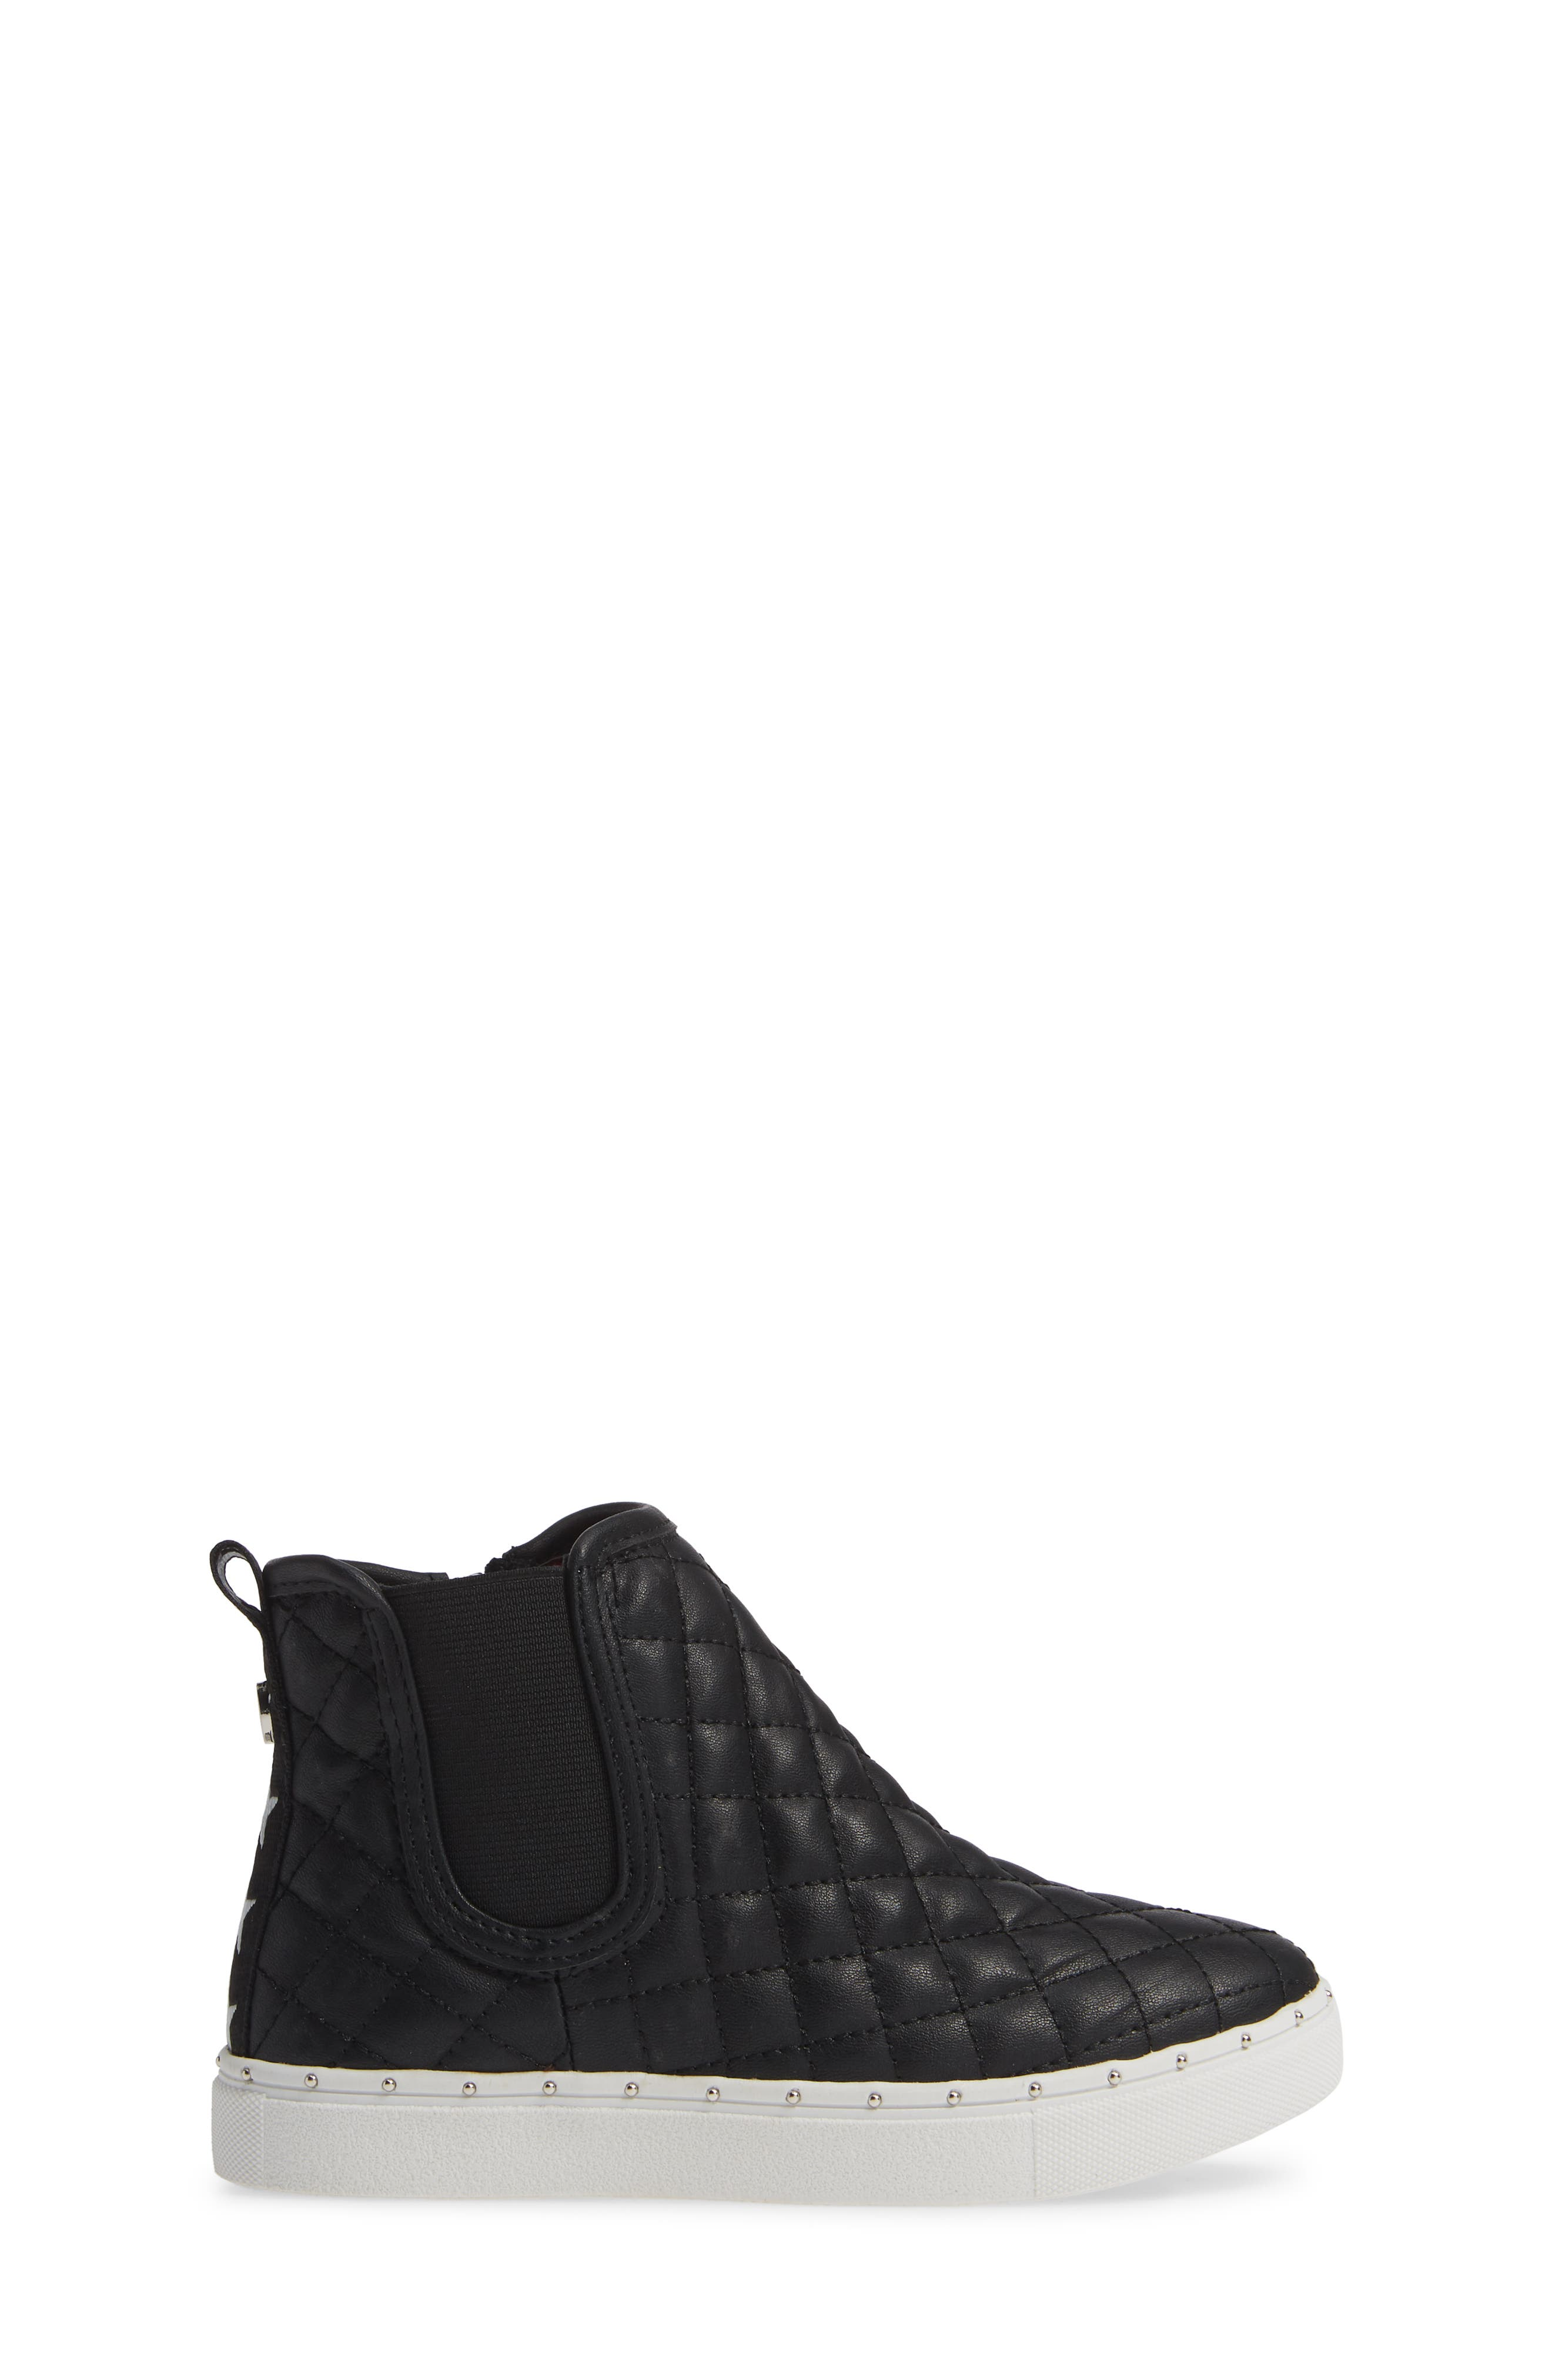 JQuest High Top Platform Sneaker,                             Alternate thumbnail 3, color,                             BLACK